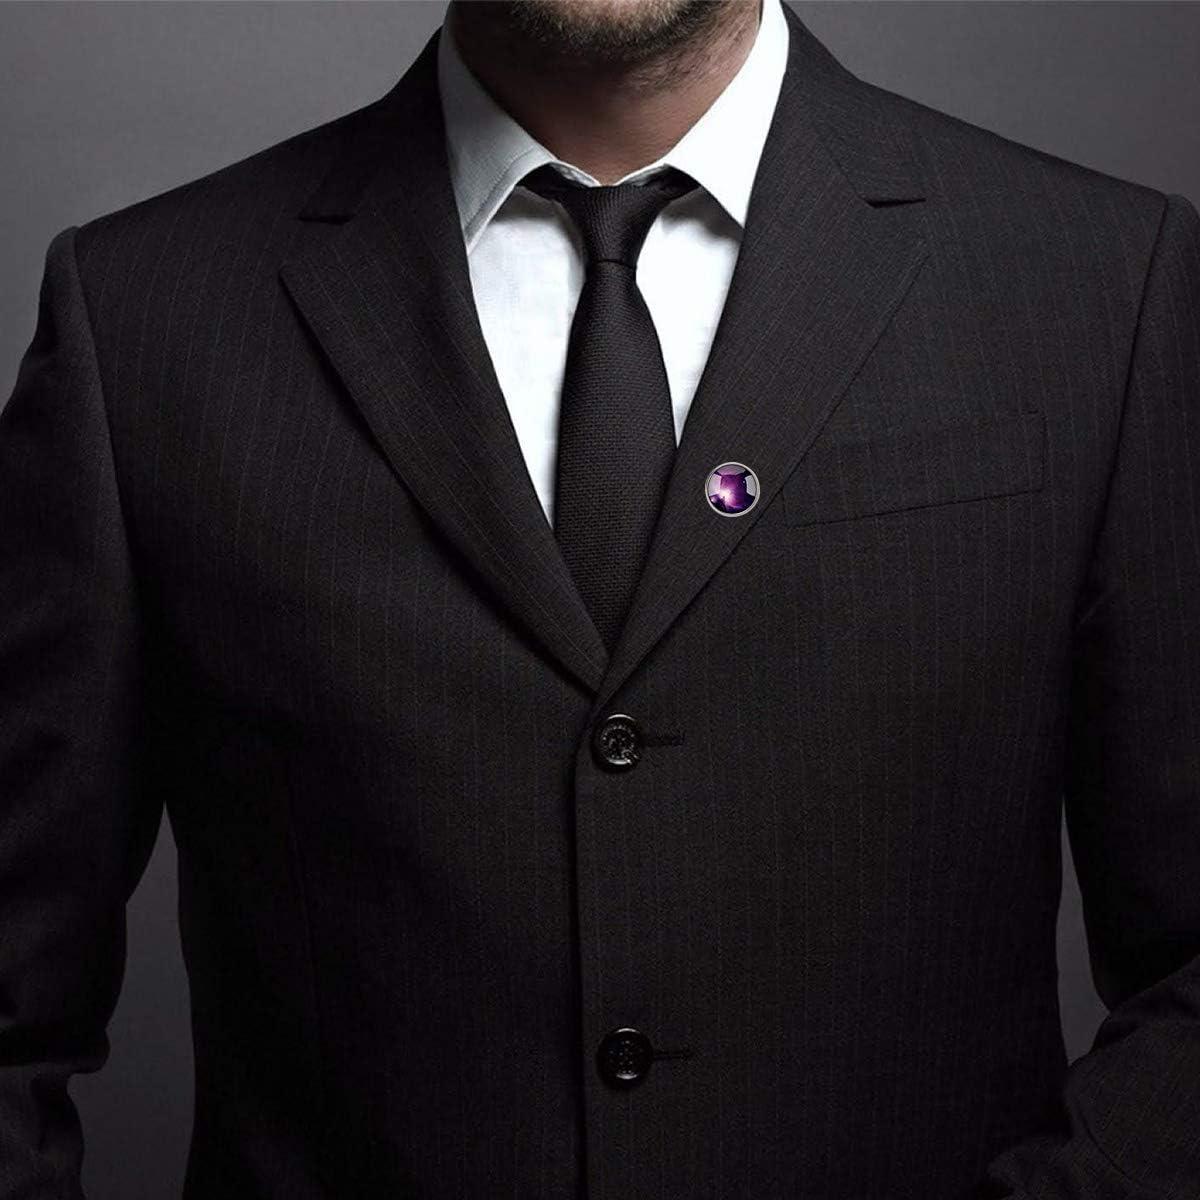 WAZZIT Round Metal Tie Tack Hat Lapel Pin Brooches Purple Cloud Universe Banquet Badge Enamel Pins Trendy Accessory Jacket T-Shirt